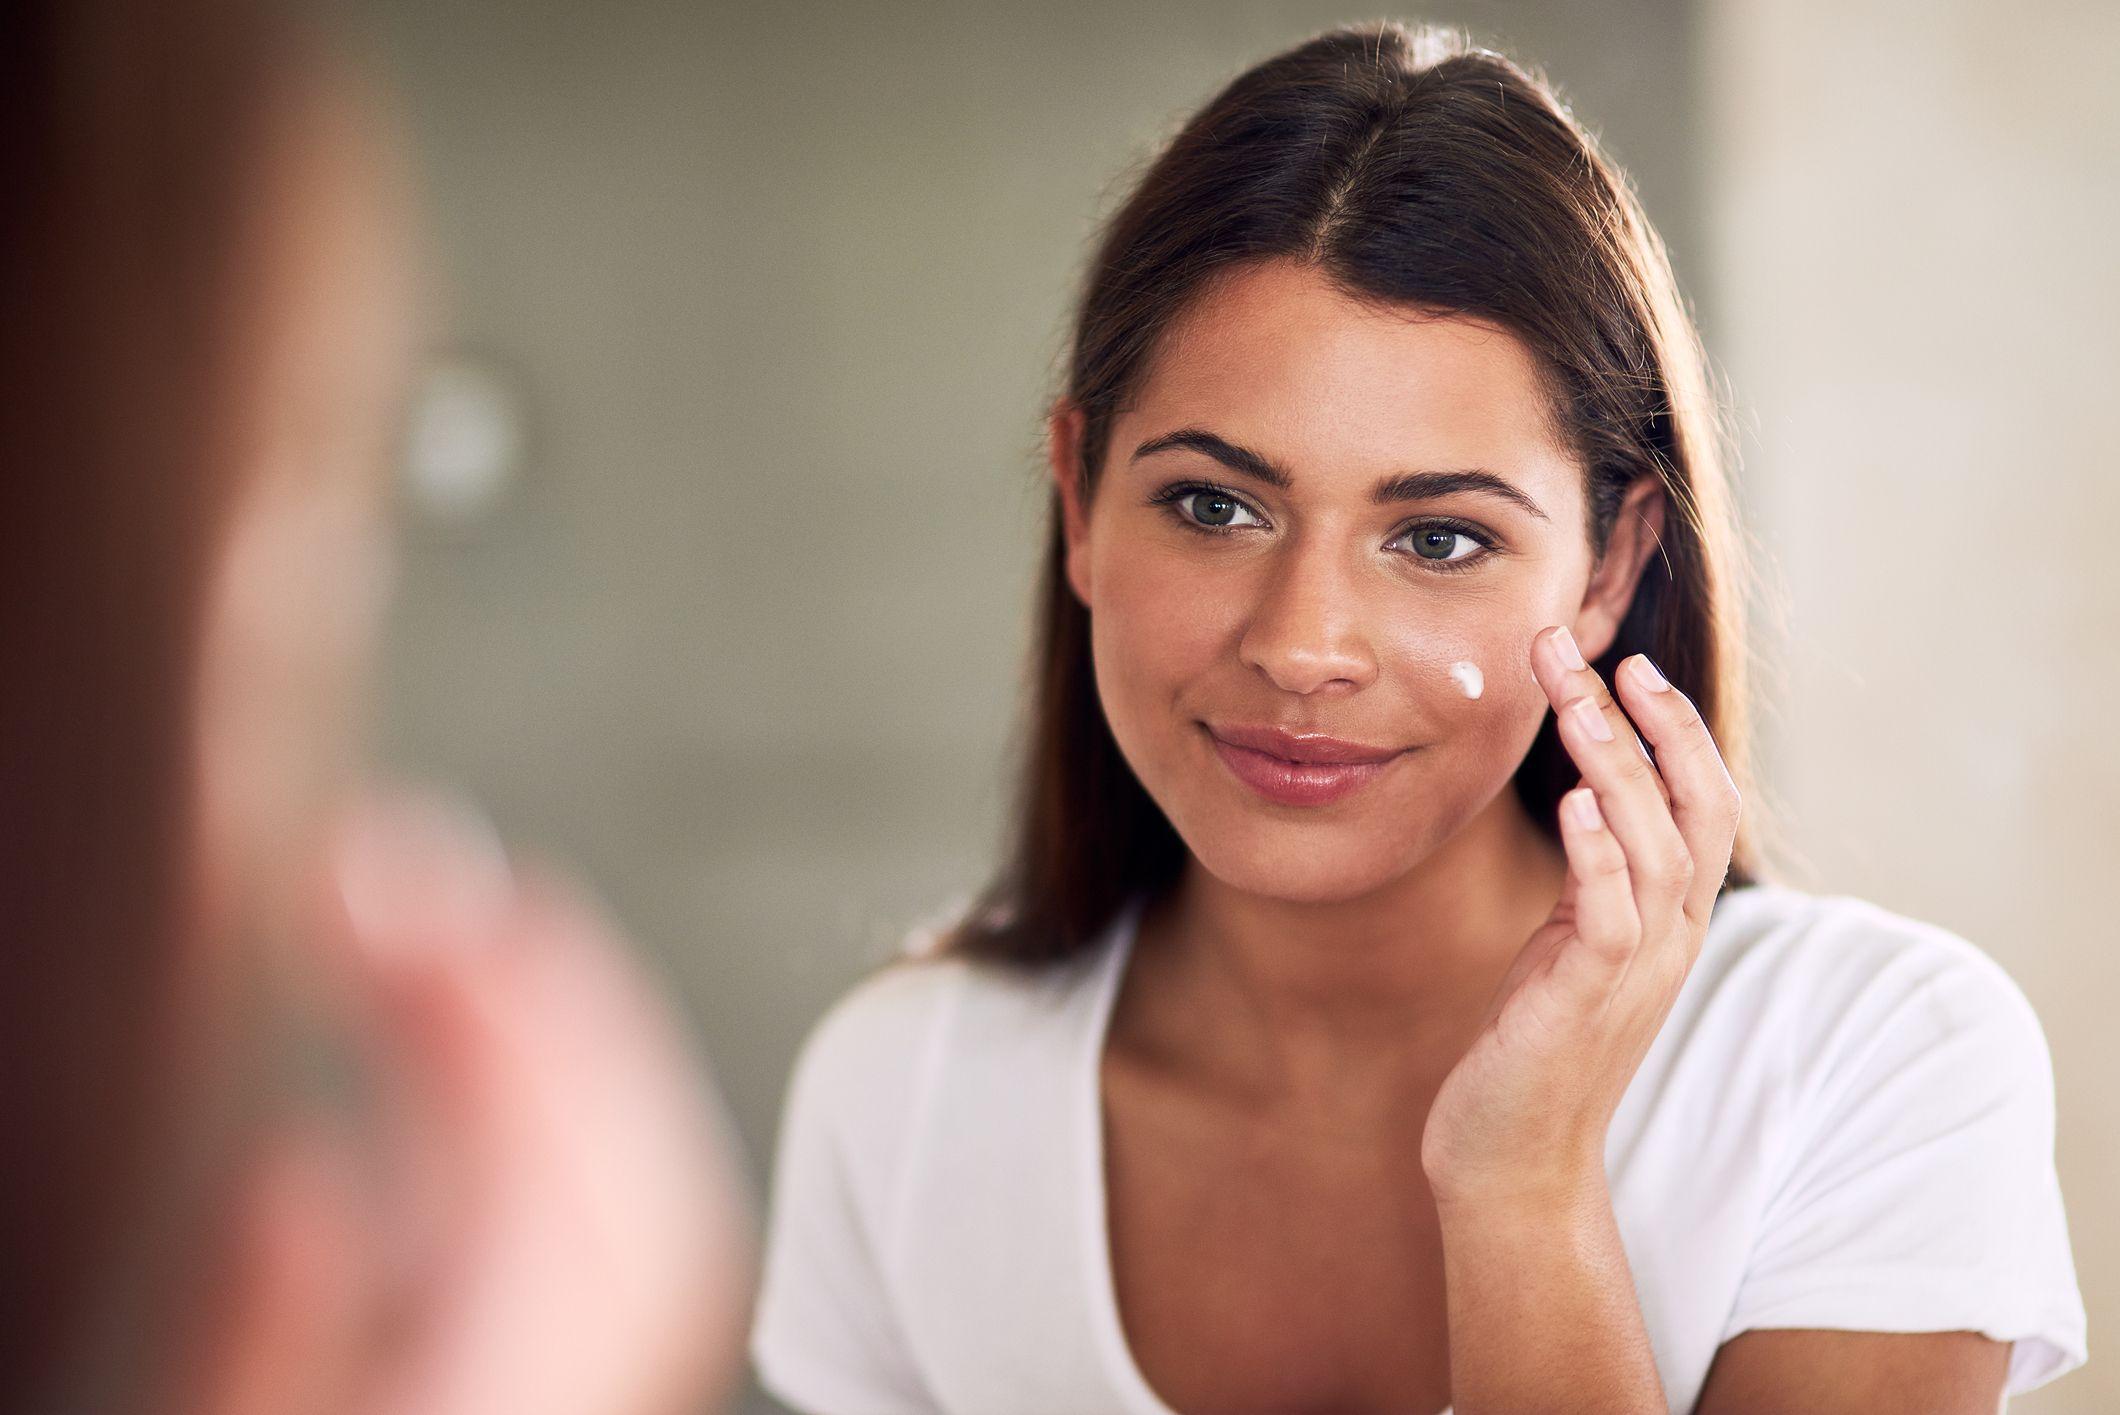 What Is Bakuchiol? The Natural Retinol Alternative for Sensitive Skin, Explained